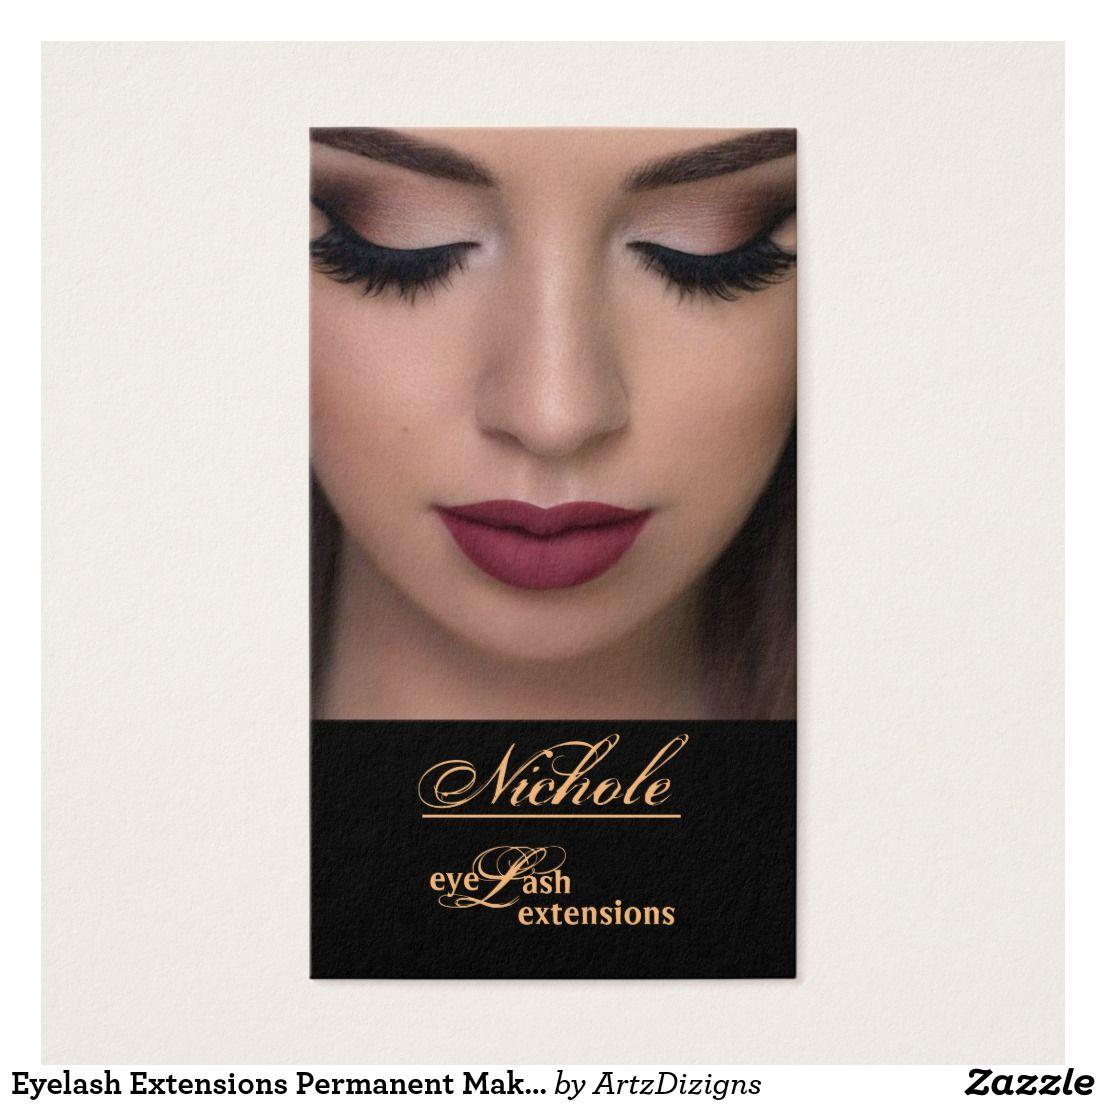 Eyelash Extensions Permanent Makeup Business Cards | Permanent makeup